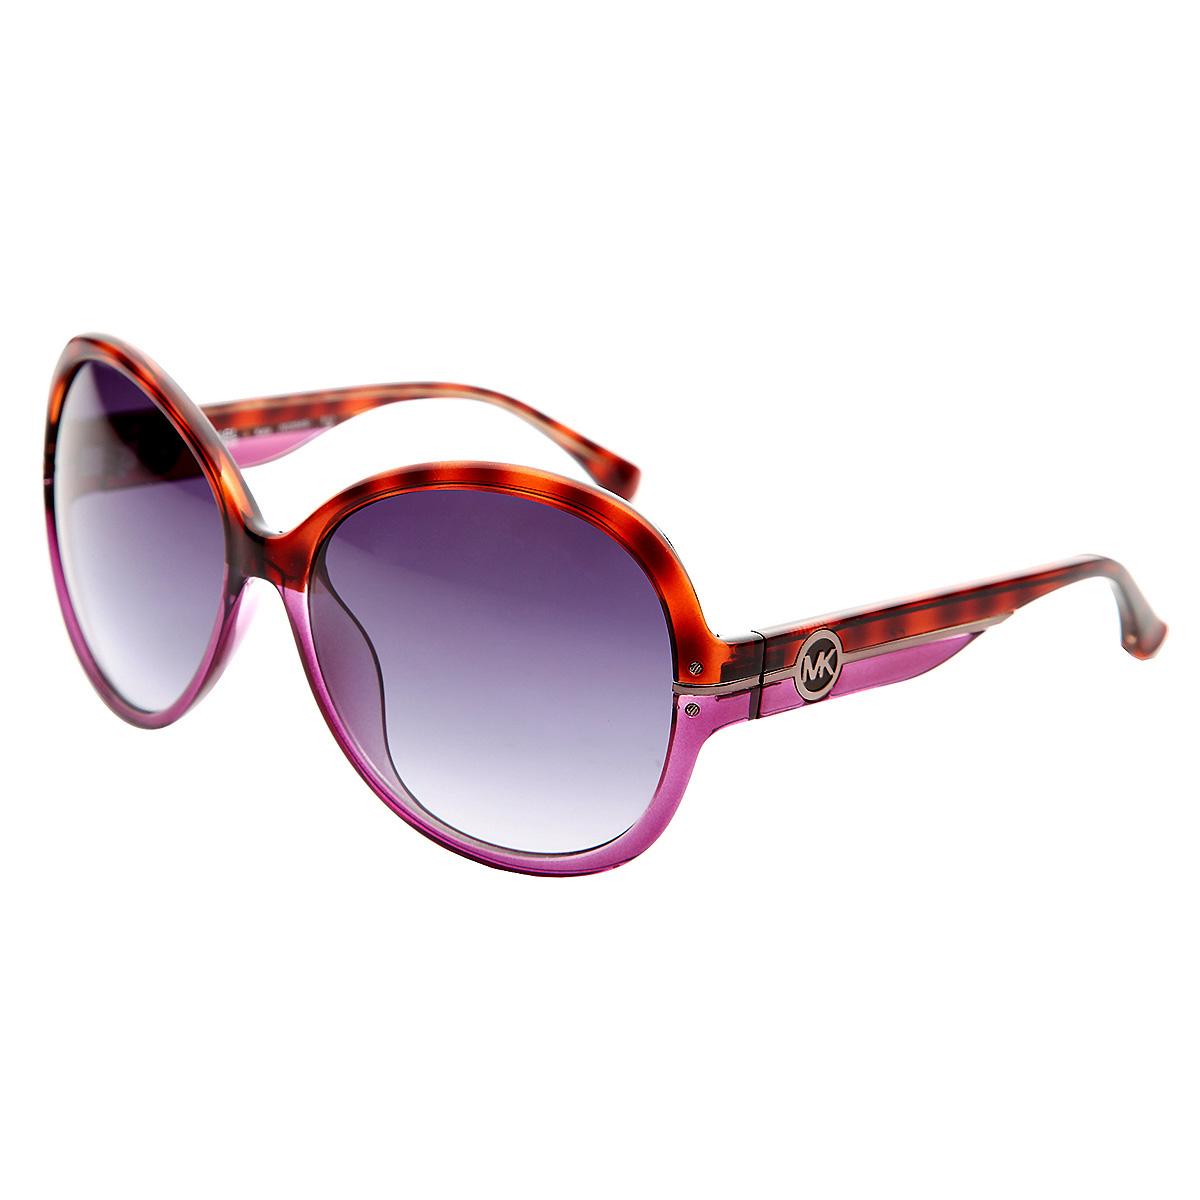 michael kors sonnenbrille m2856s 513 damen kate ladys sunglasses lila neu ovp. Black Bedroom Furniture Sets. Home Design Ideas